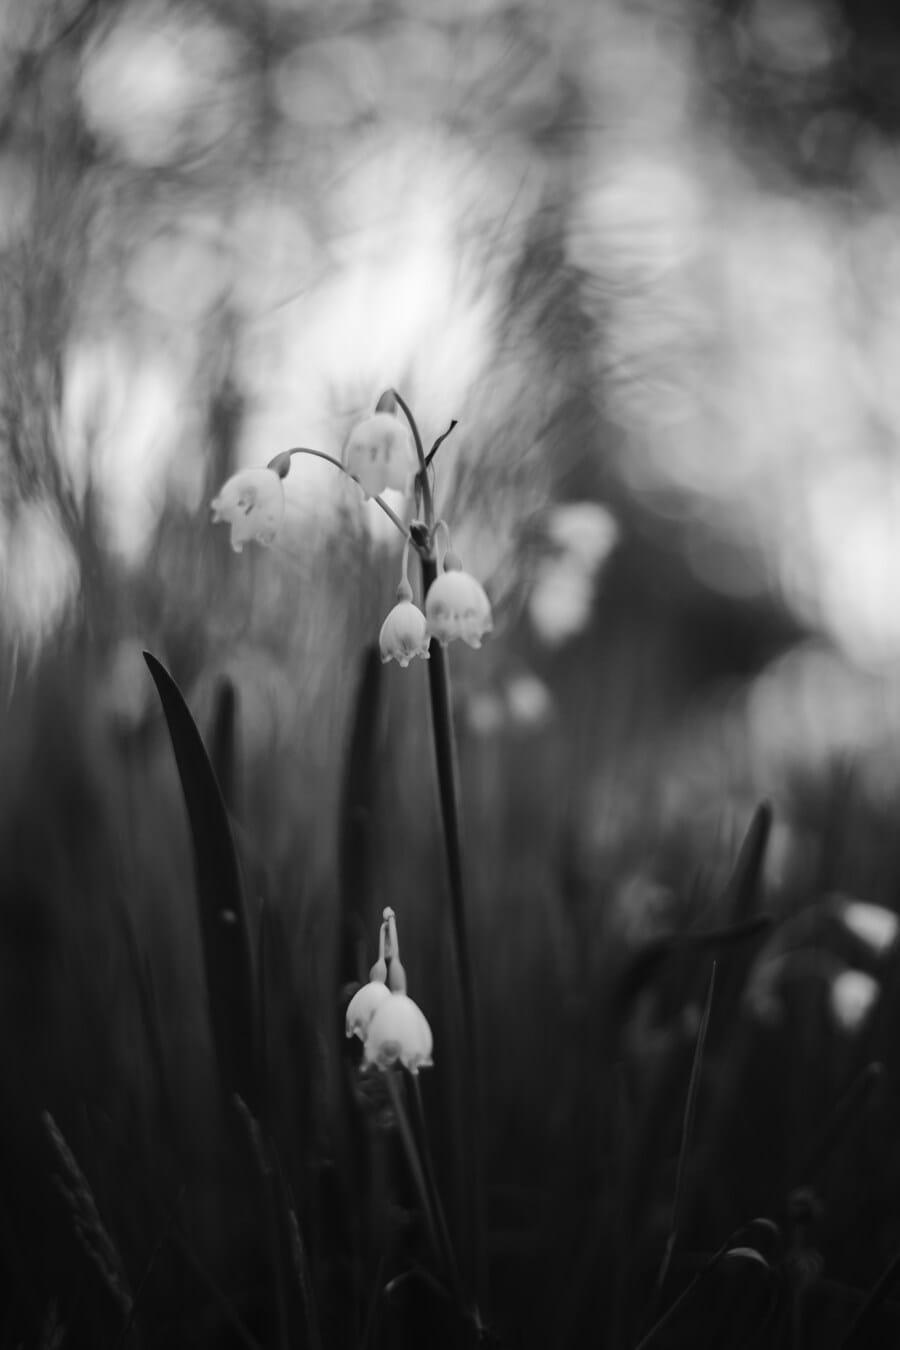 monochrome, white flower, spring time, black and white, grassy, flower, plant, nature, grass, leaf